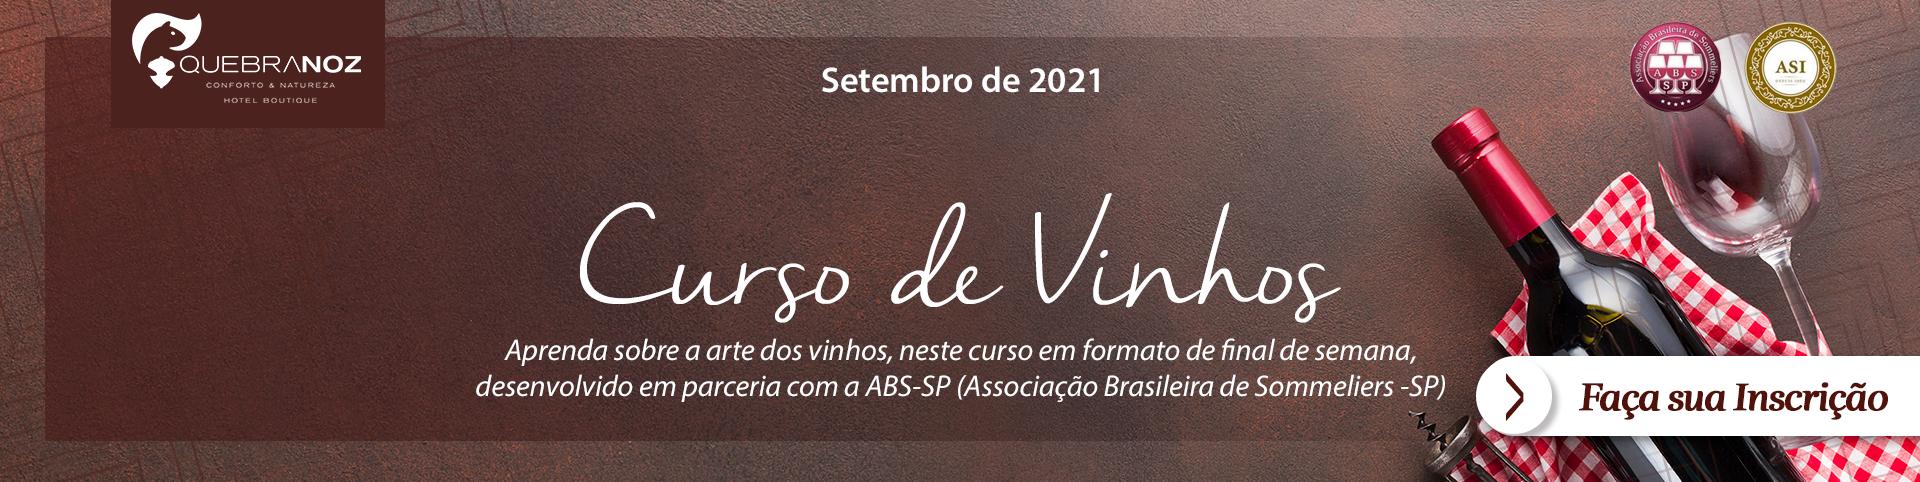 Curso Básico de Vinhos - Hotel Boutique Quebra-Noz